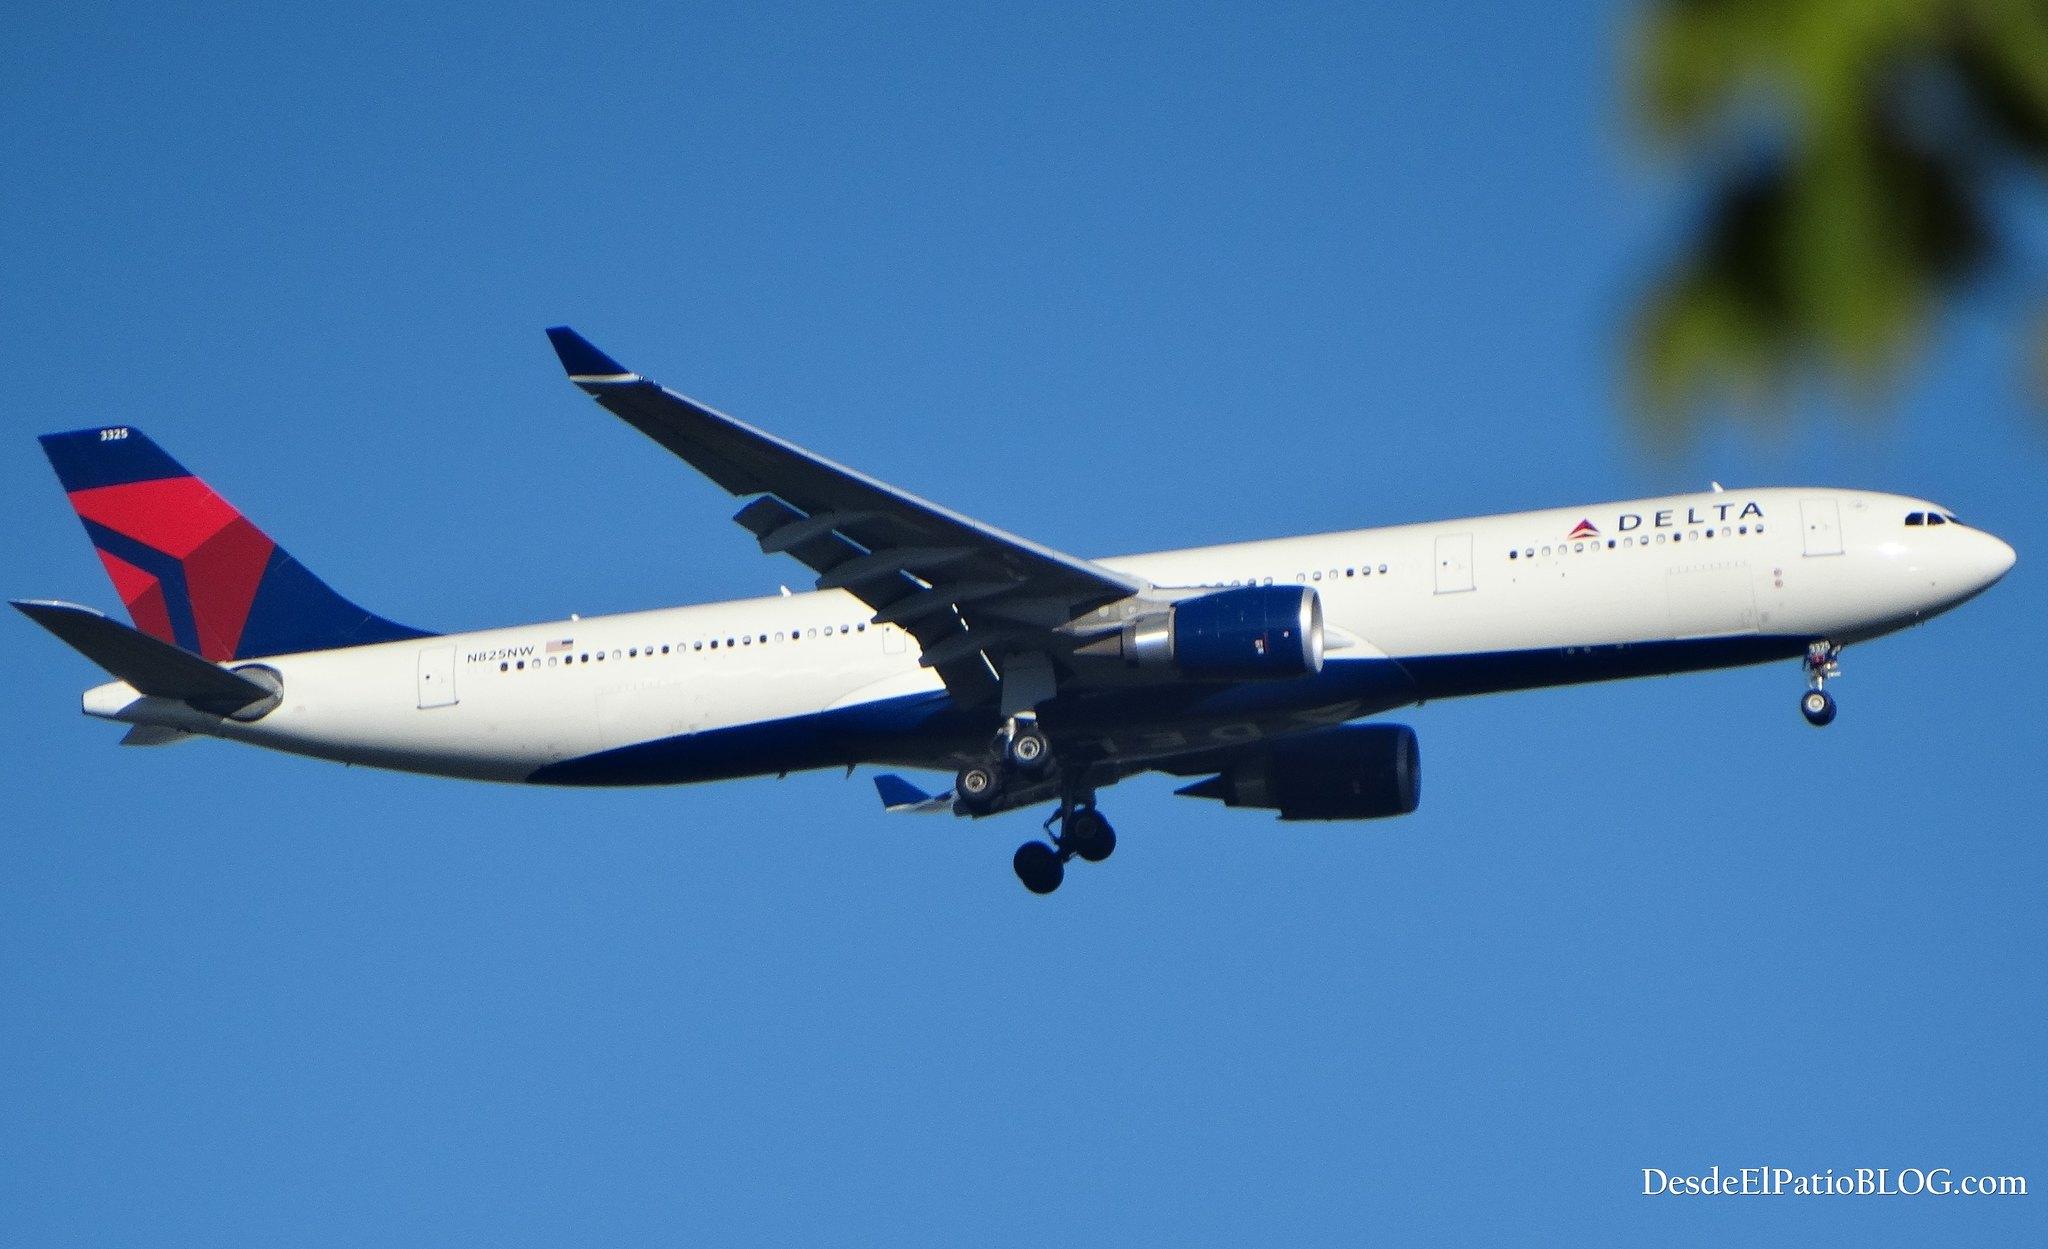 Alitalia foto boeing 777 alitalia 39